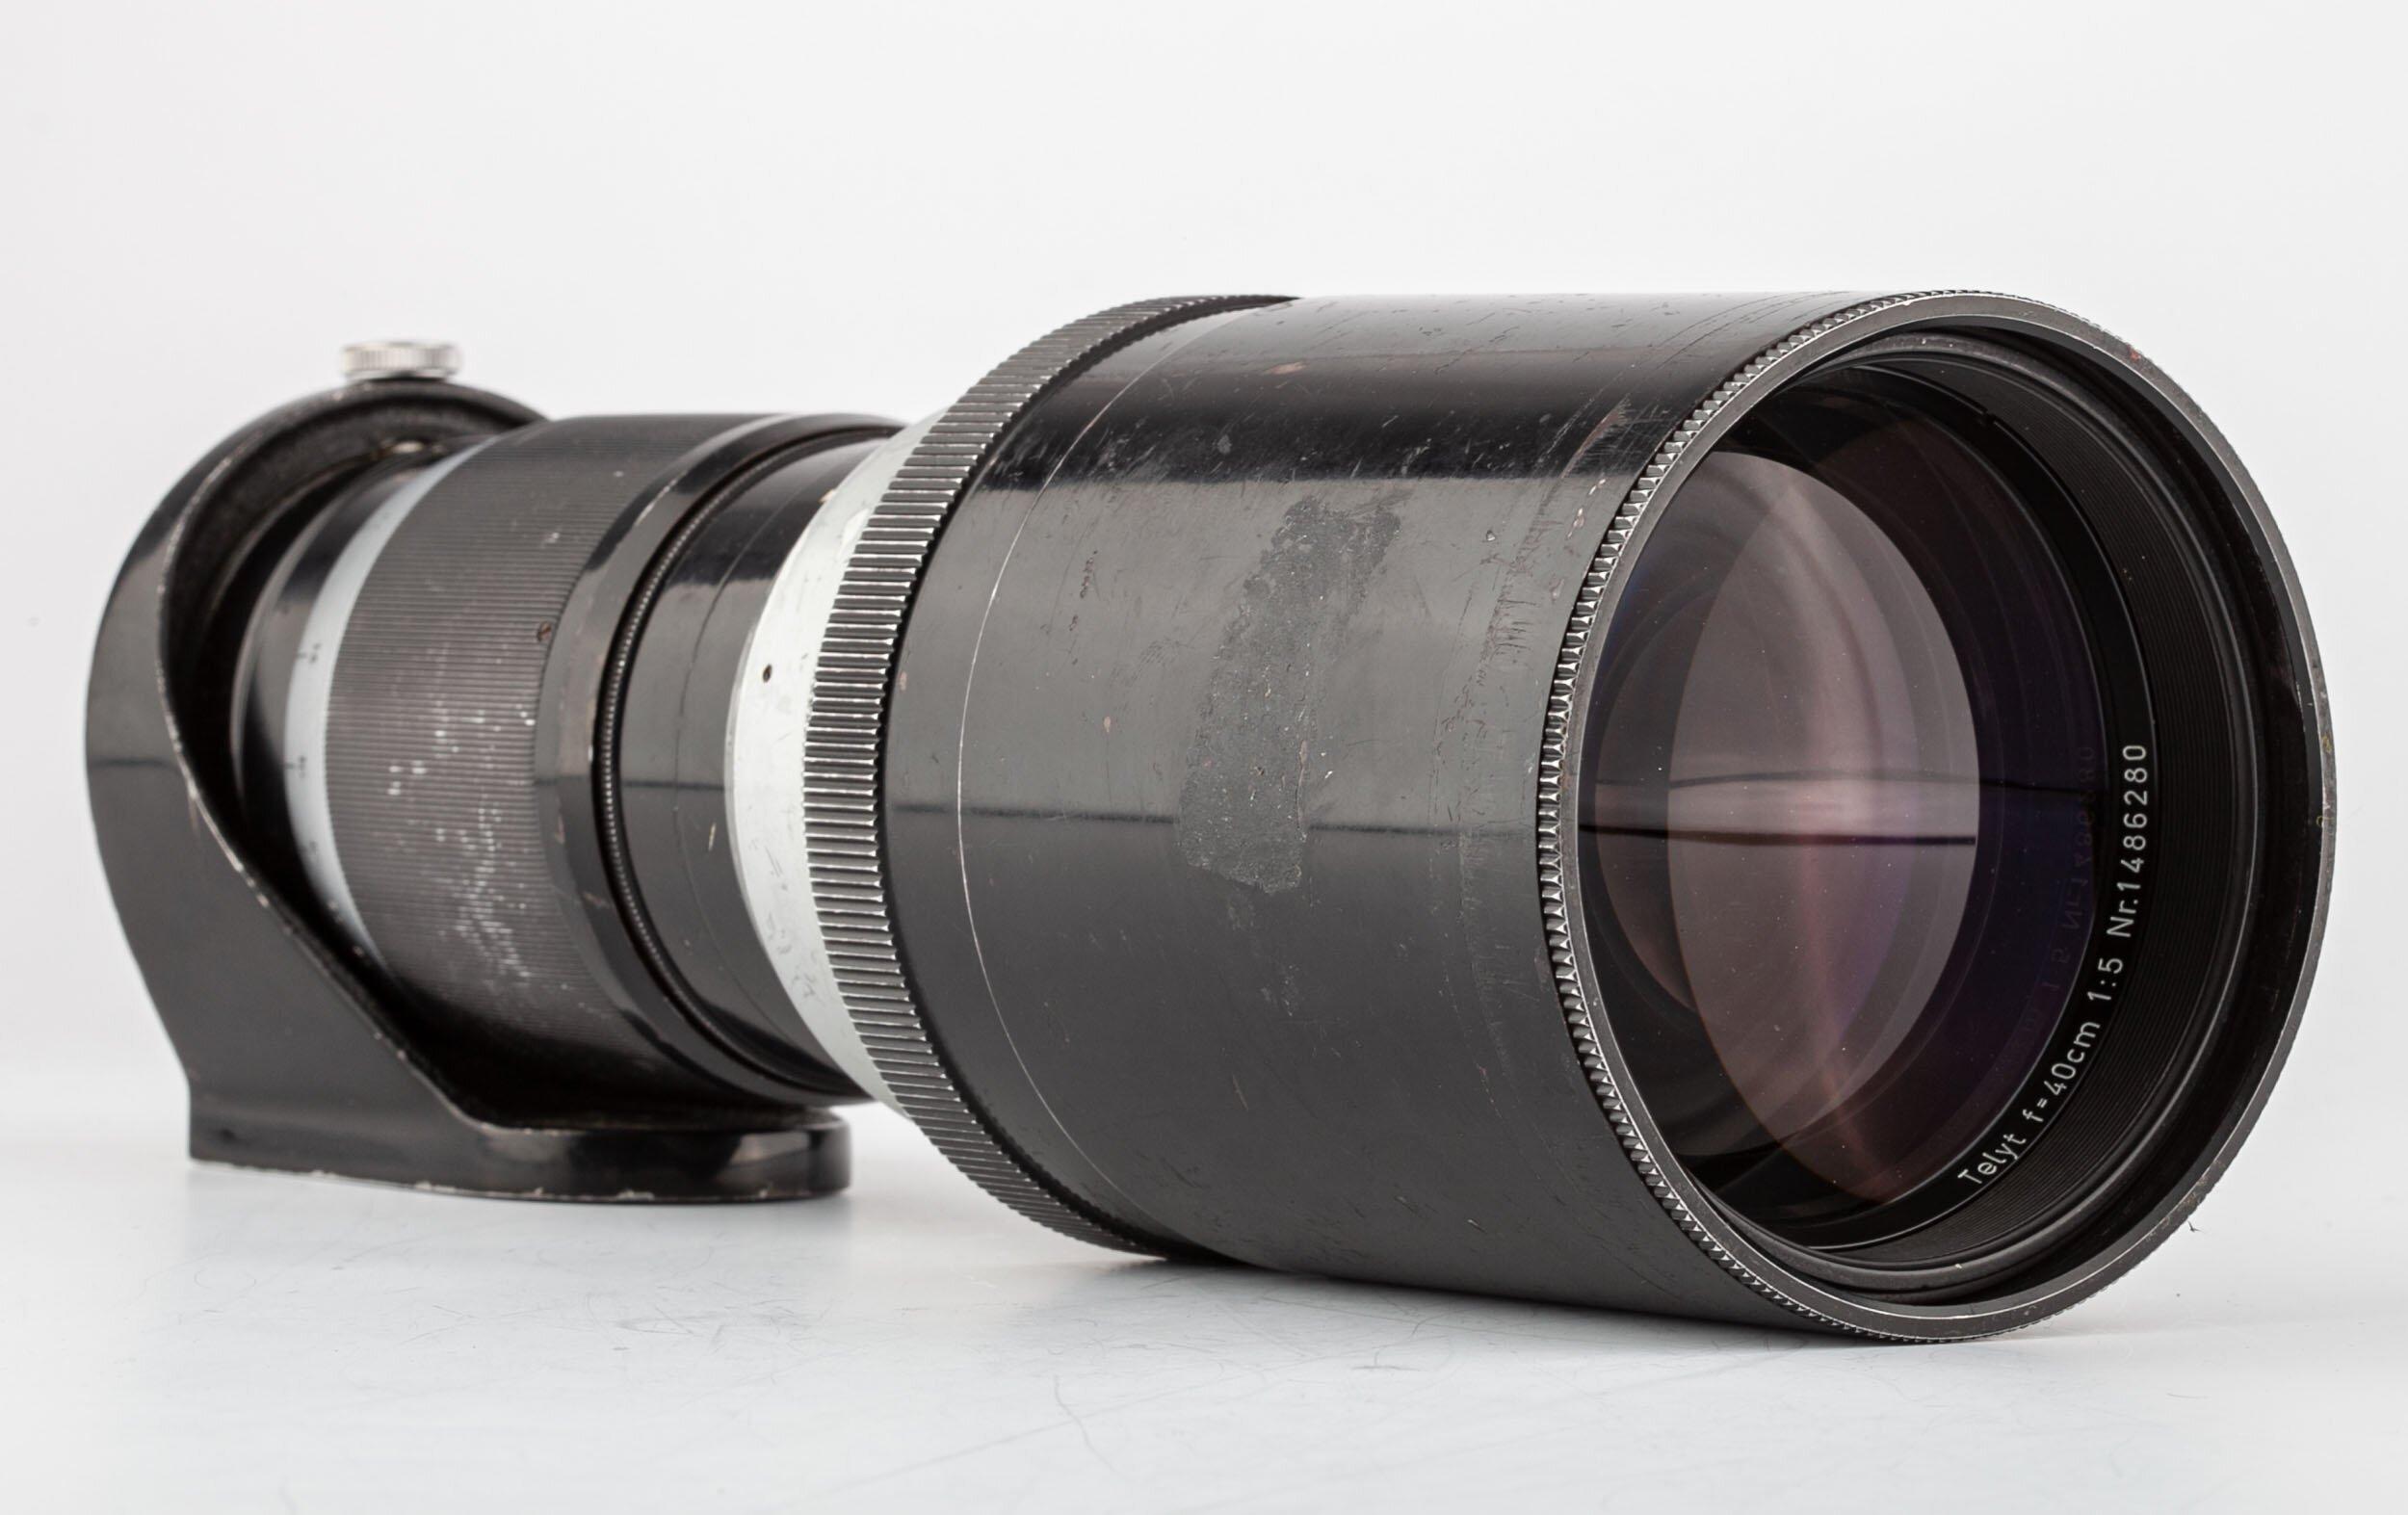 Leica Telyt 40cm F5 Visoflex TLCOO 11726 M39